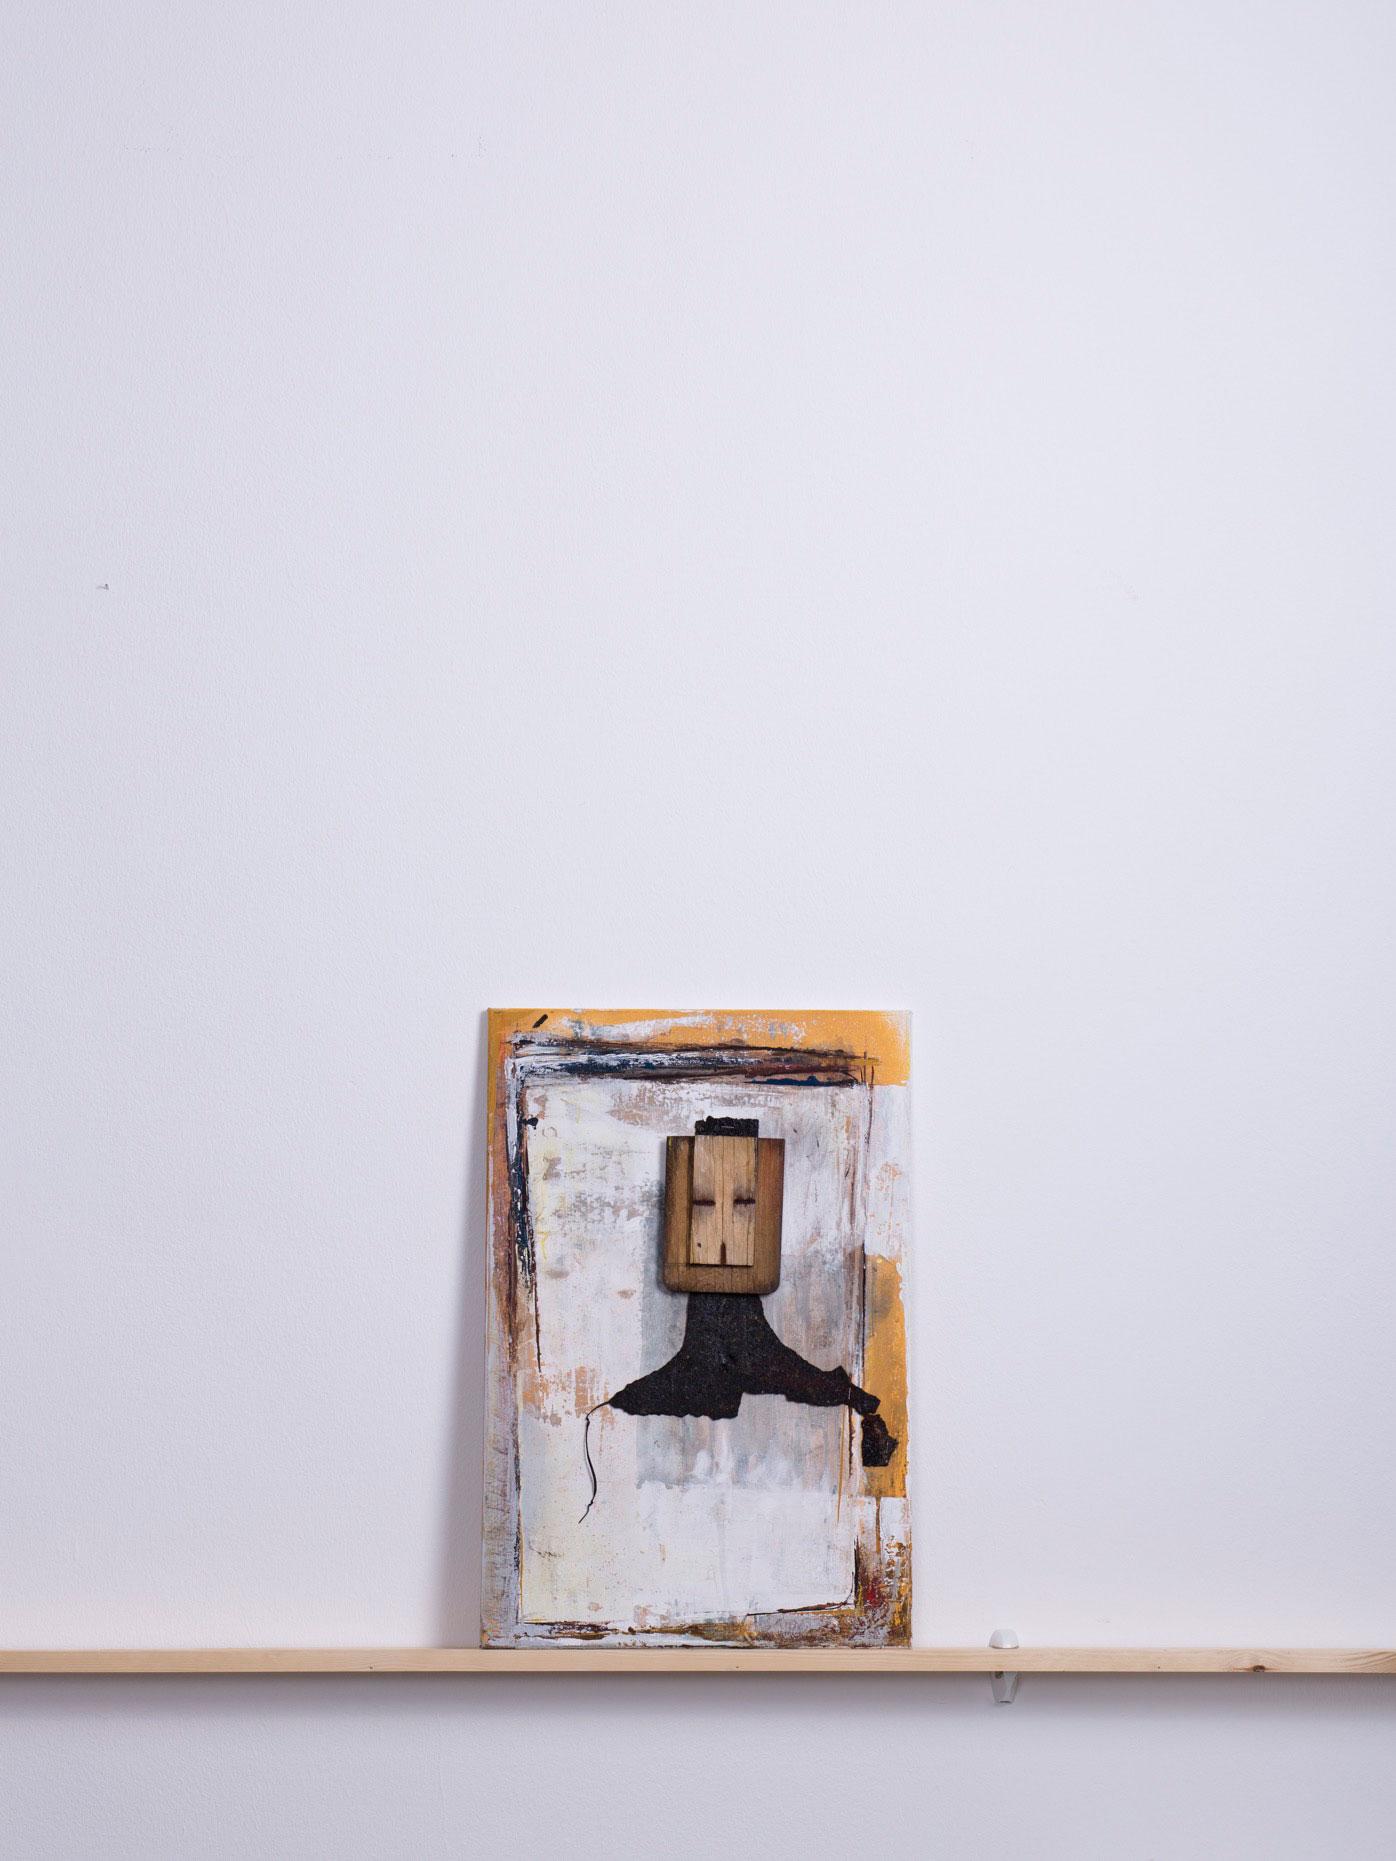 Saramura, 2011 - 40x60 cm, <br>Acryl, Holz und Pappe auf Leinwand